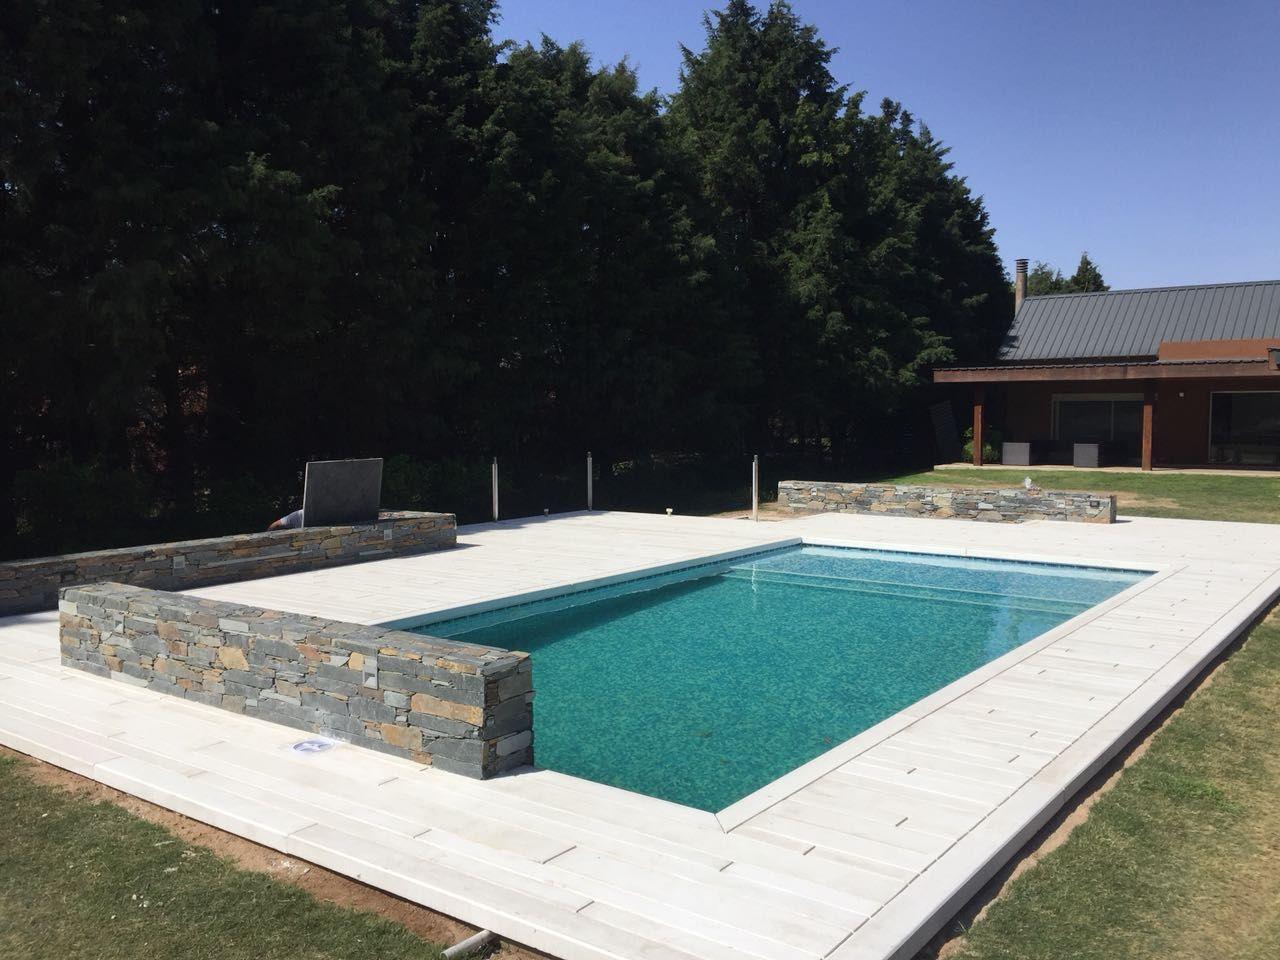 piscina familiar + swimming pool + arquitectura wellness + diseÑo